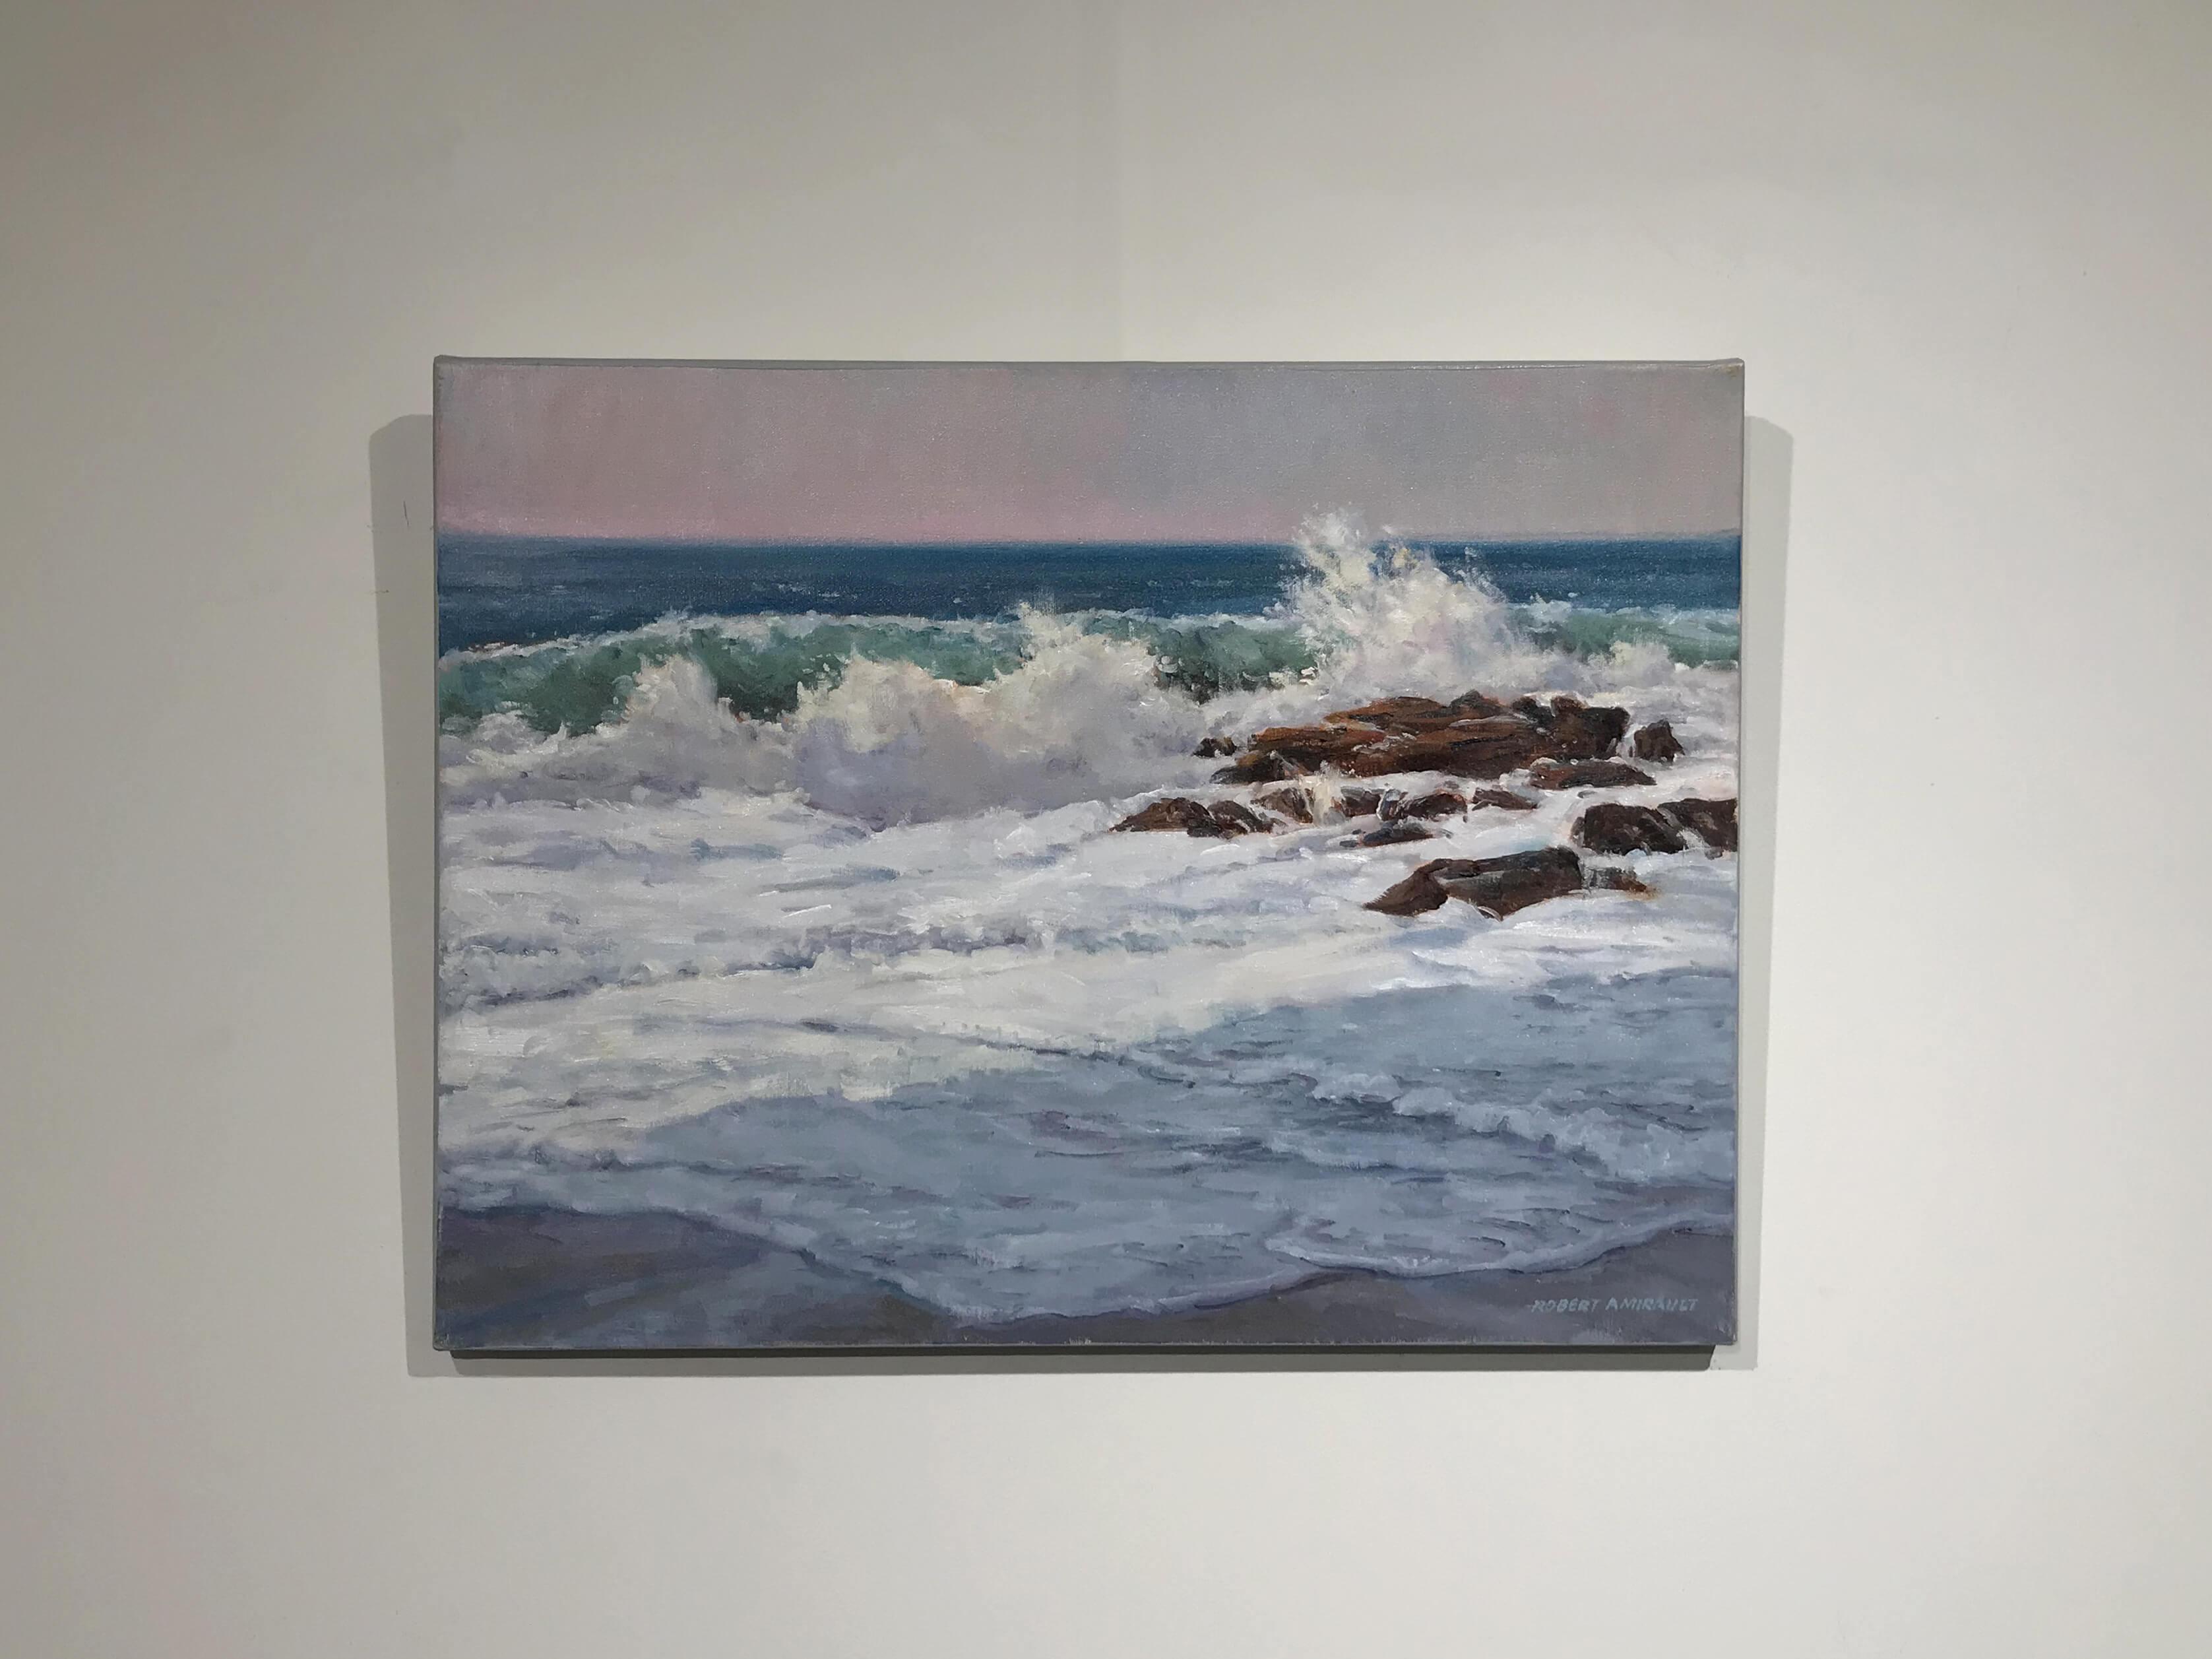 Robert Amirault Surf Shadows 18X24 Detail 1